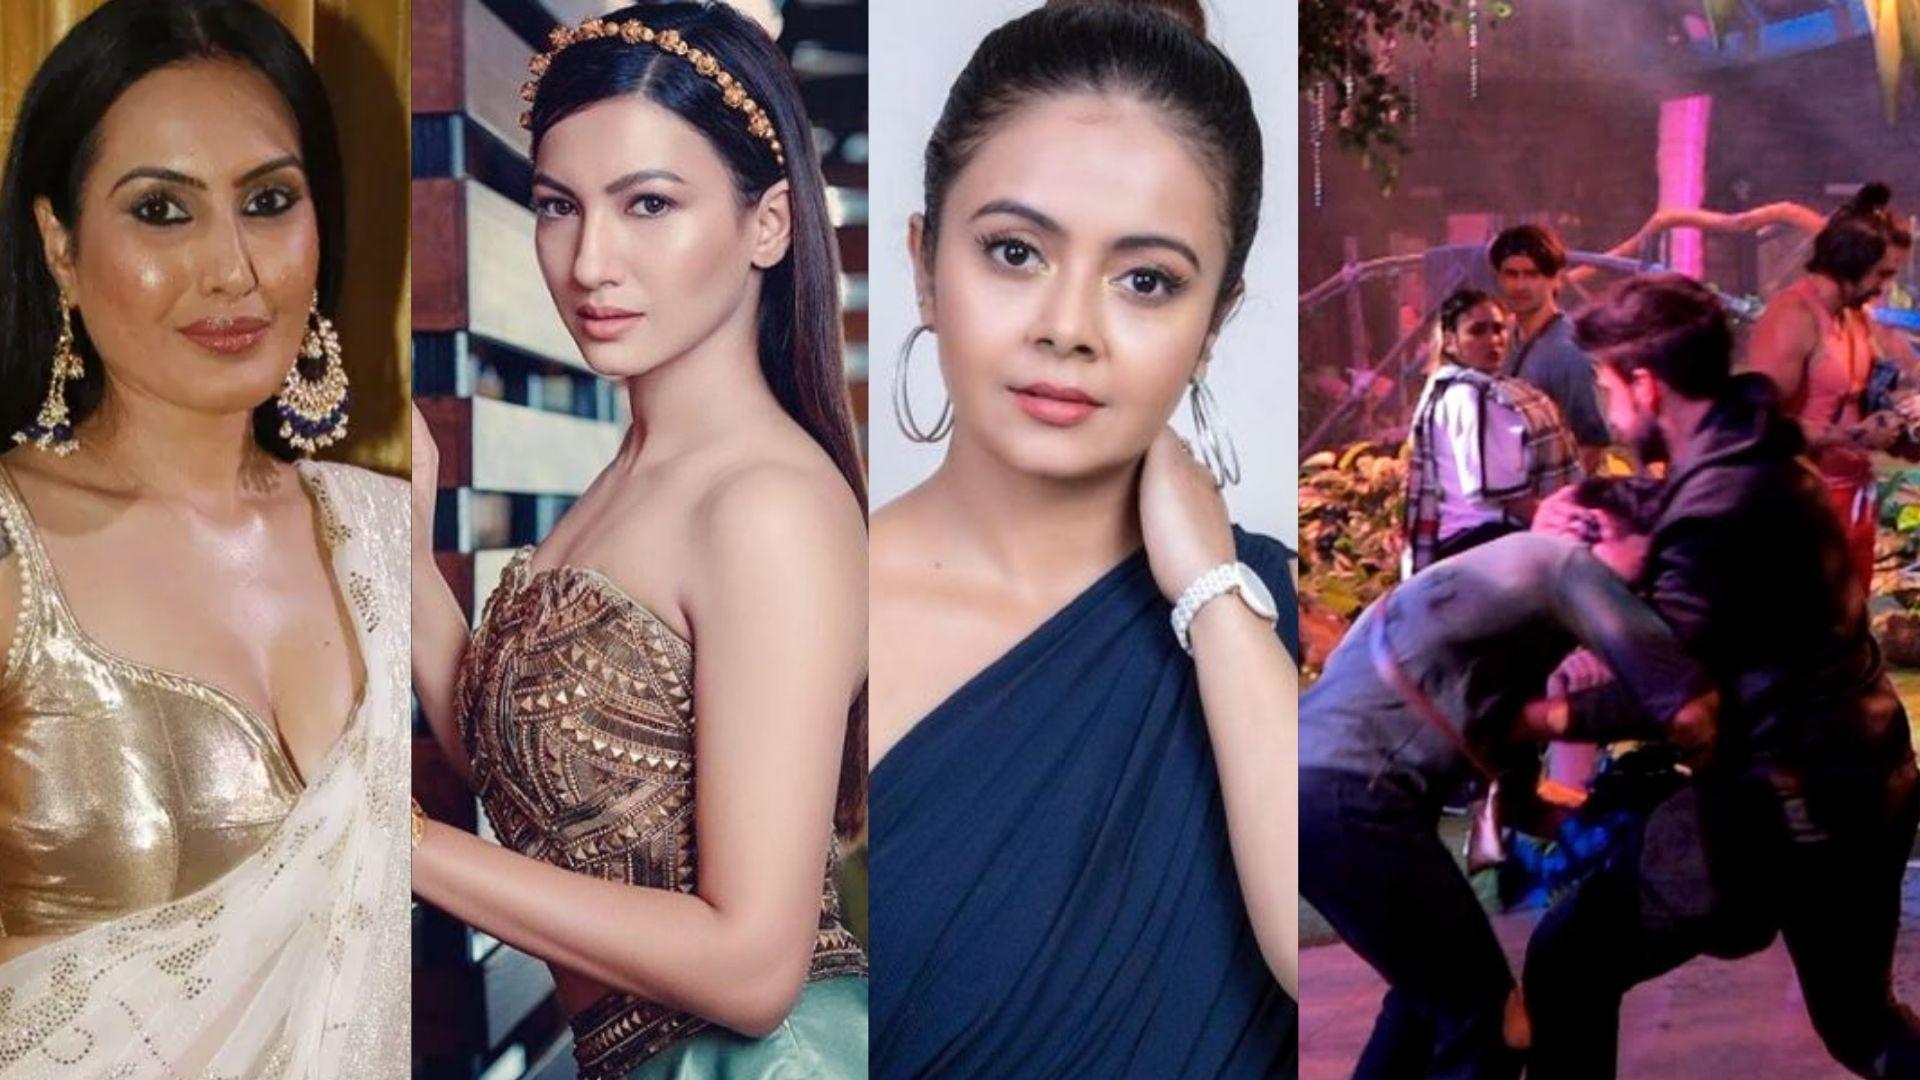 Bigg Boss 15: Devoleena, Gauahar Khan, Kamya Punjabi Bash Karan Kundrra For Slamming Pratik Sehajpal On The Floor; Netizens Demand Eviction